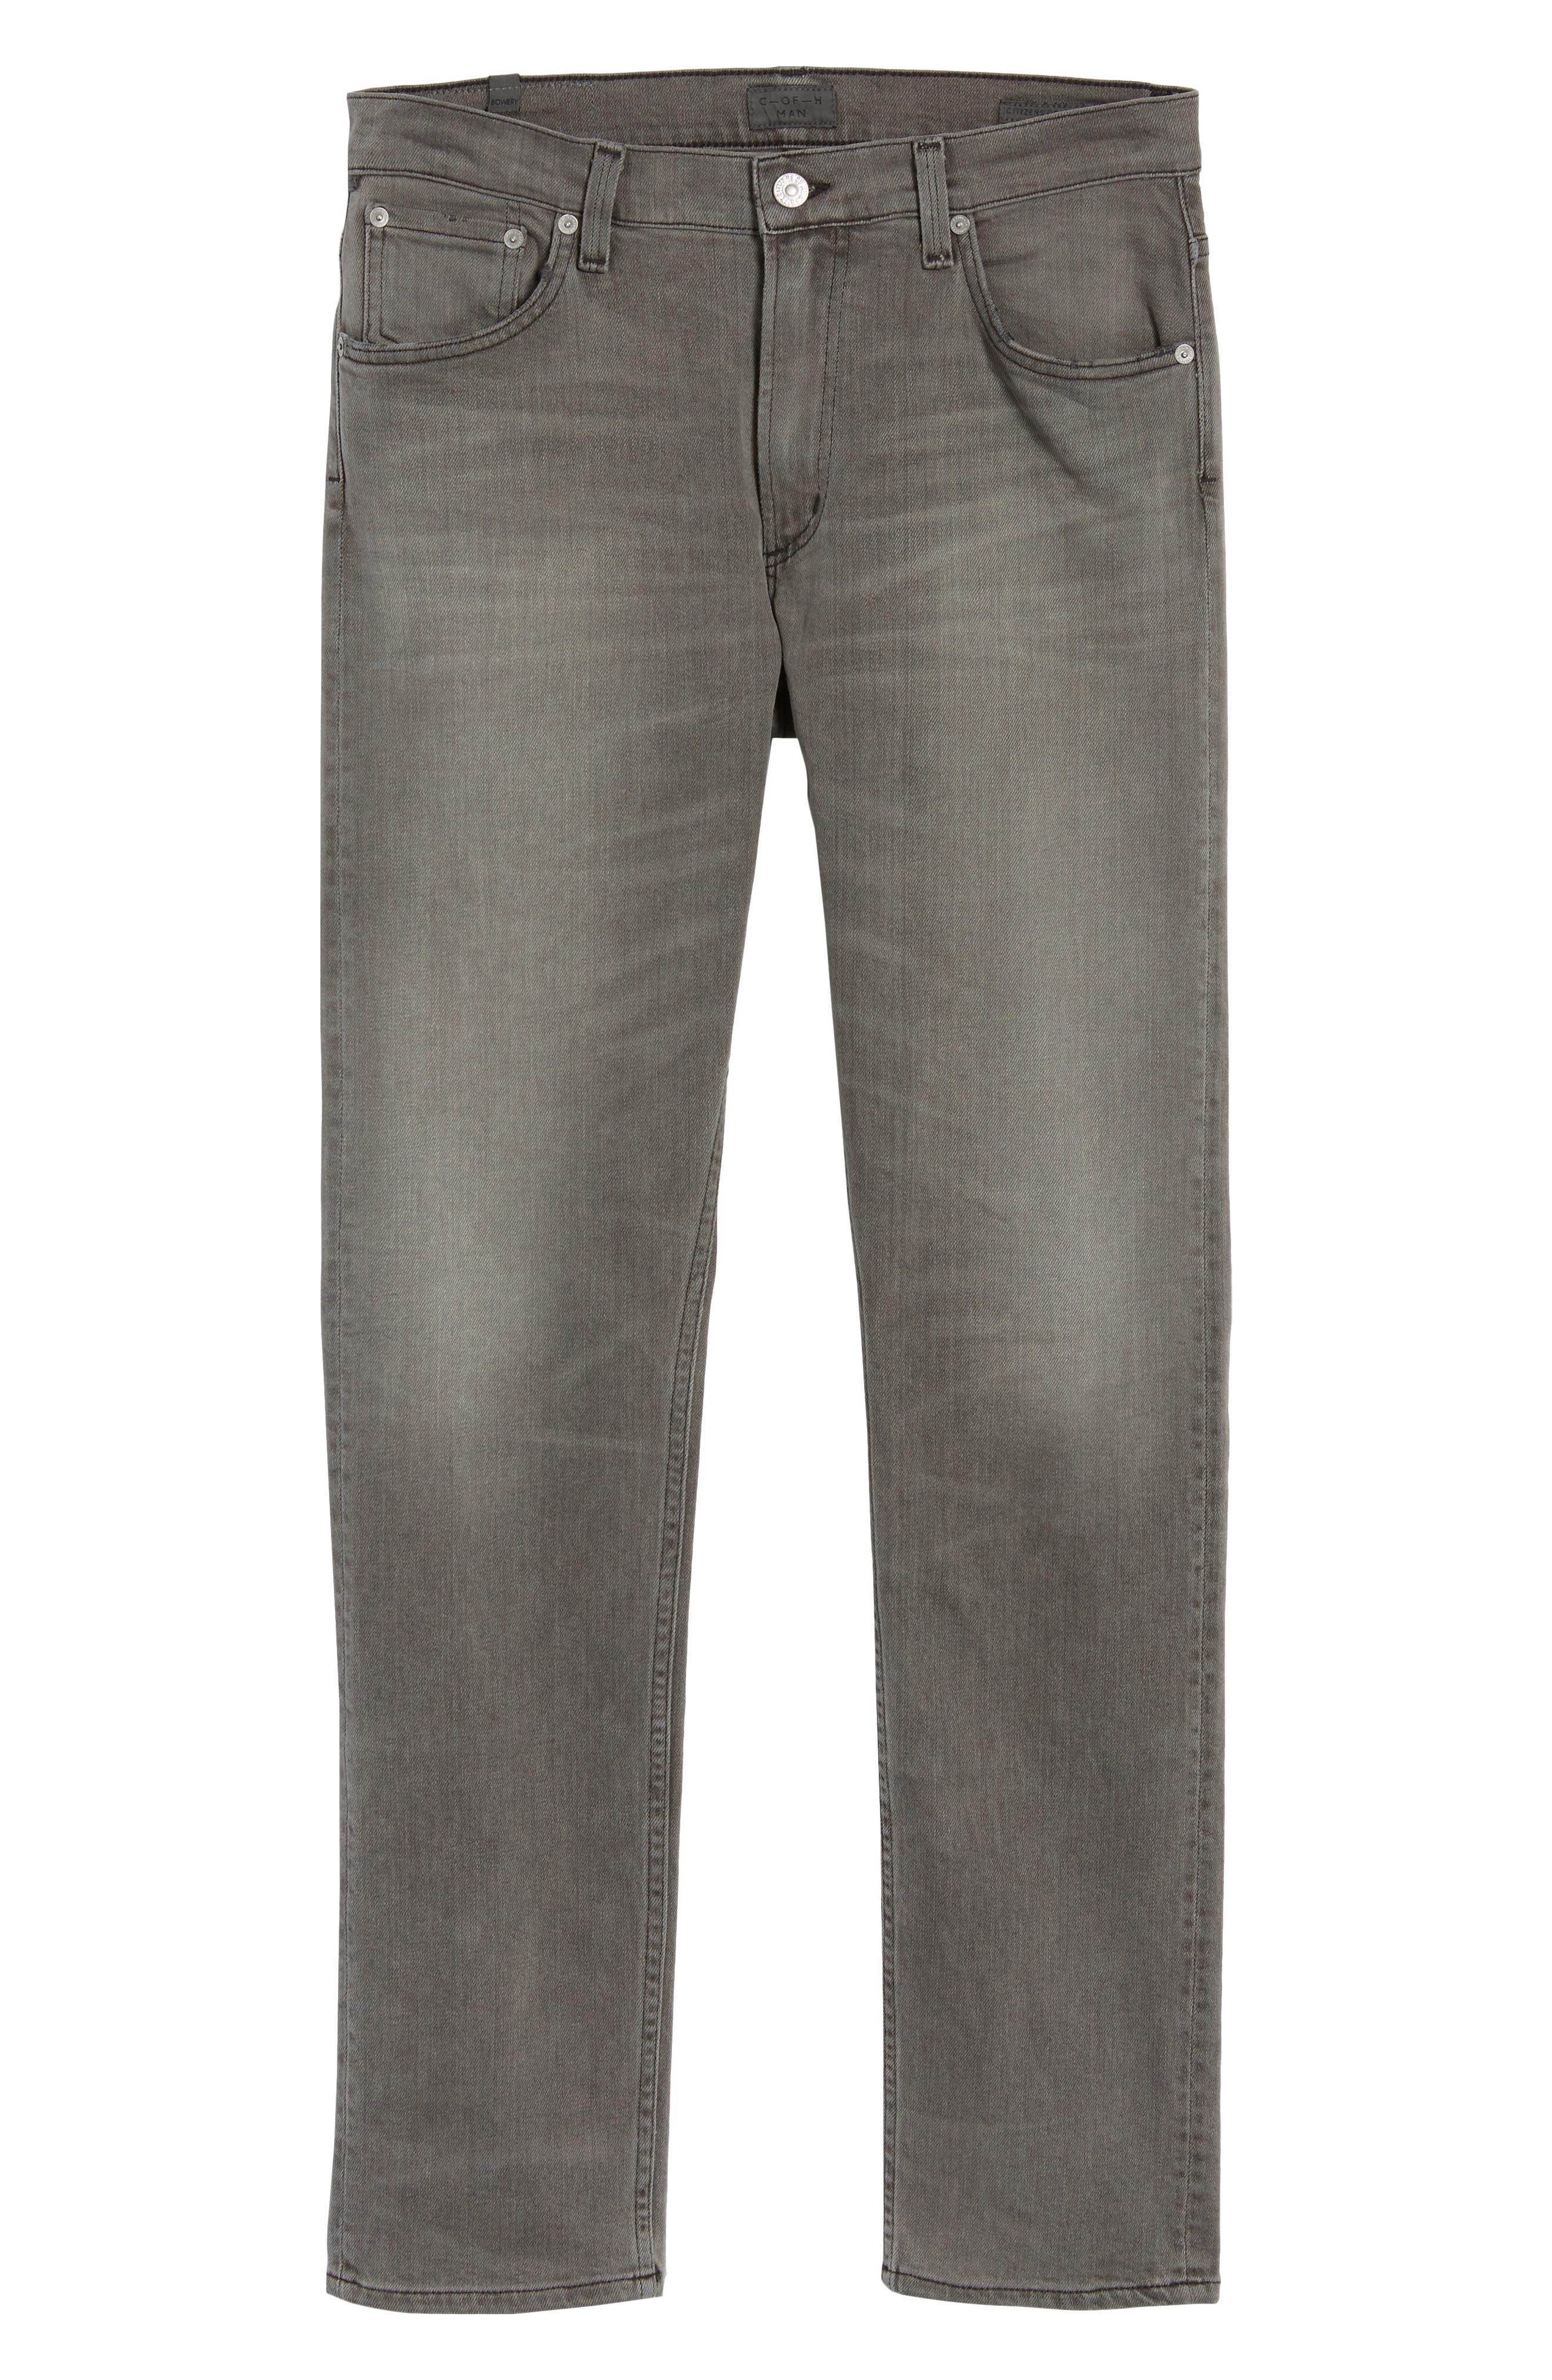 Bowery Slim Fit Jeans,                             Alternate thumbnail 6, color,                             Leon